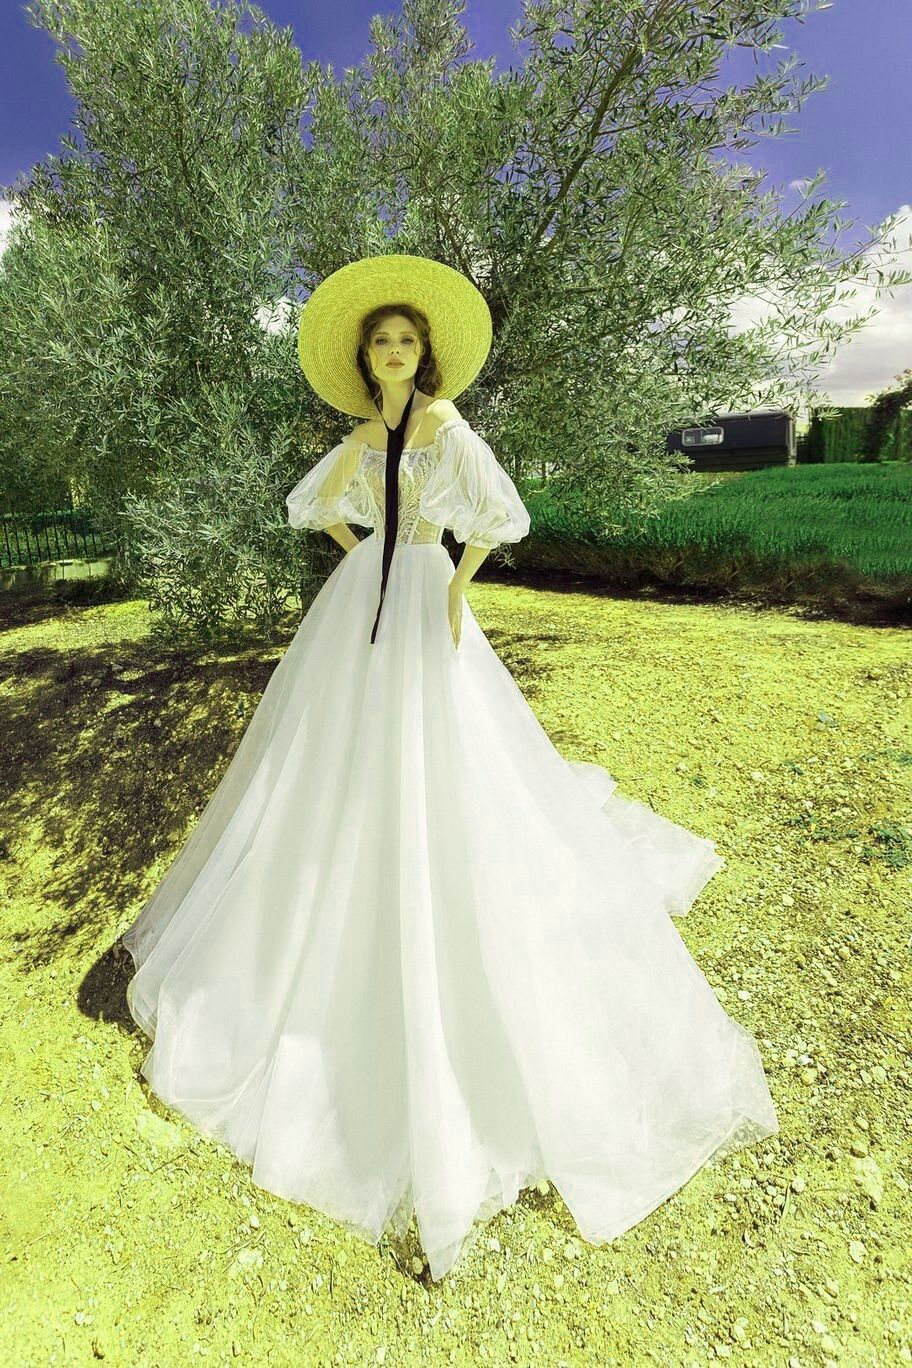 Short Wedding Dress With Sneakers Wedding Dresses Dresses Red Wedding Dresses [ 1368 x 912 Pixel ]